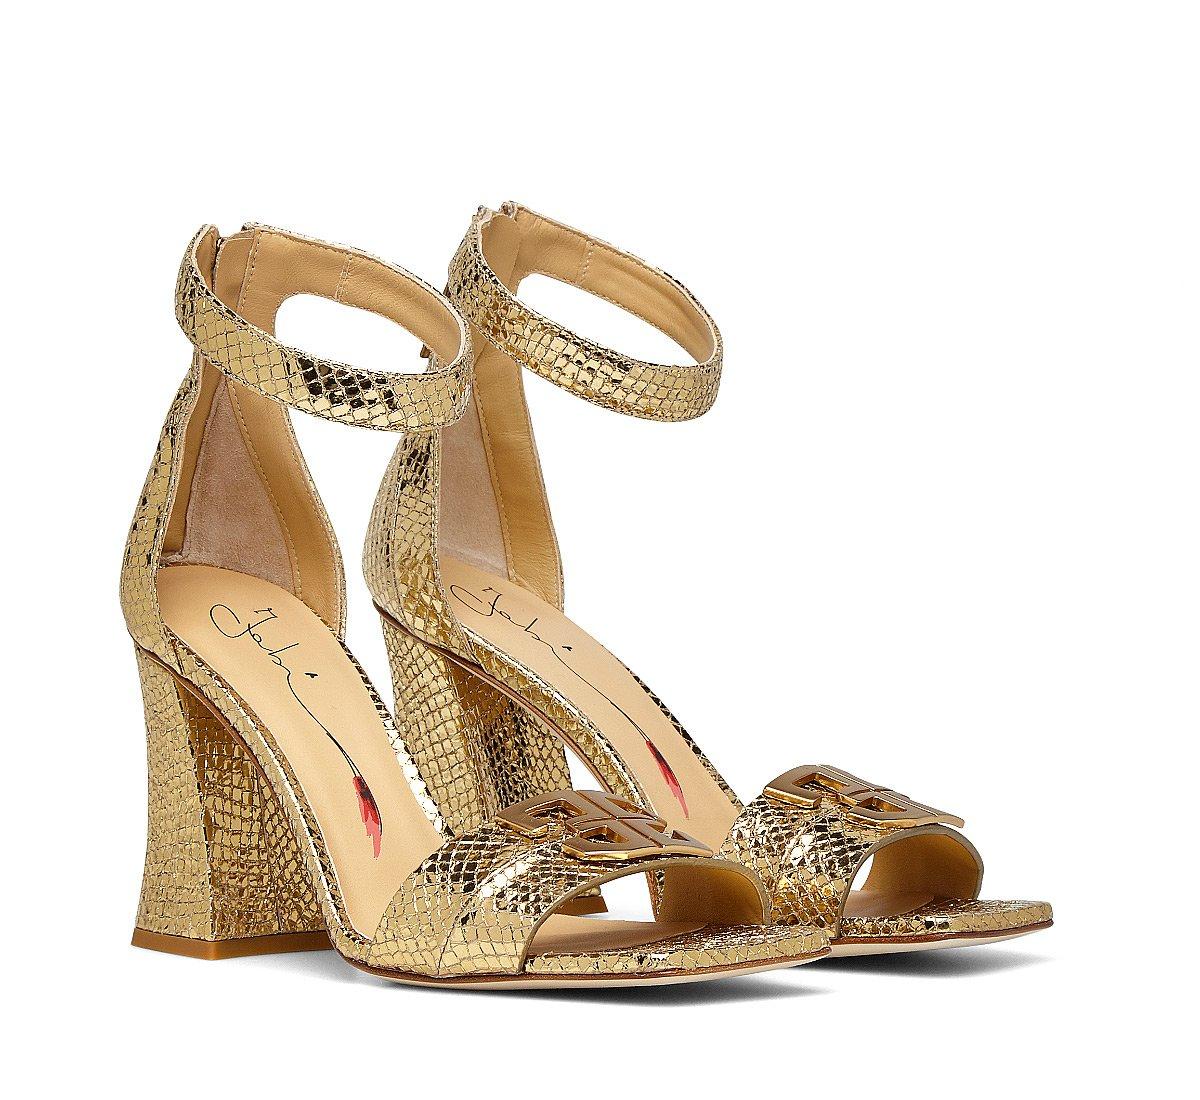 Laminated calfskin sandals